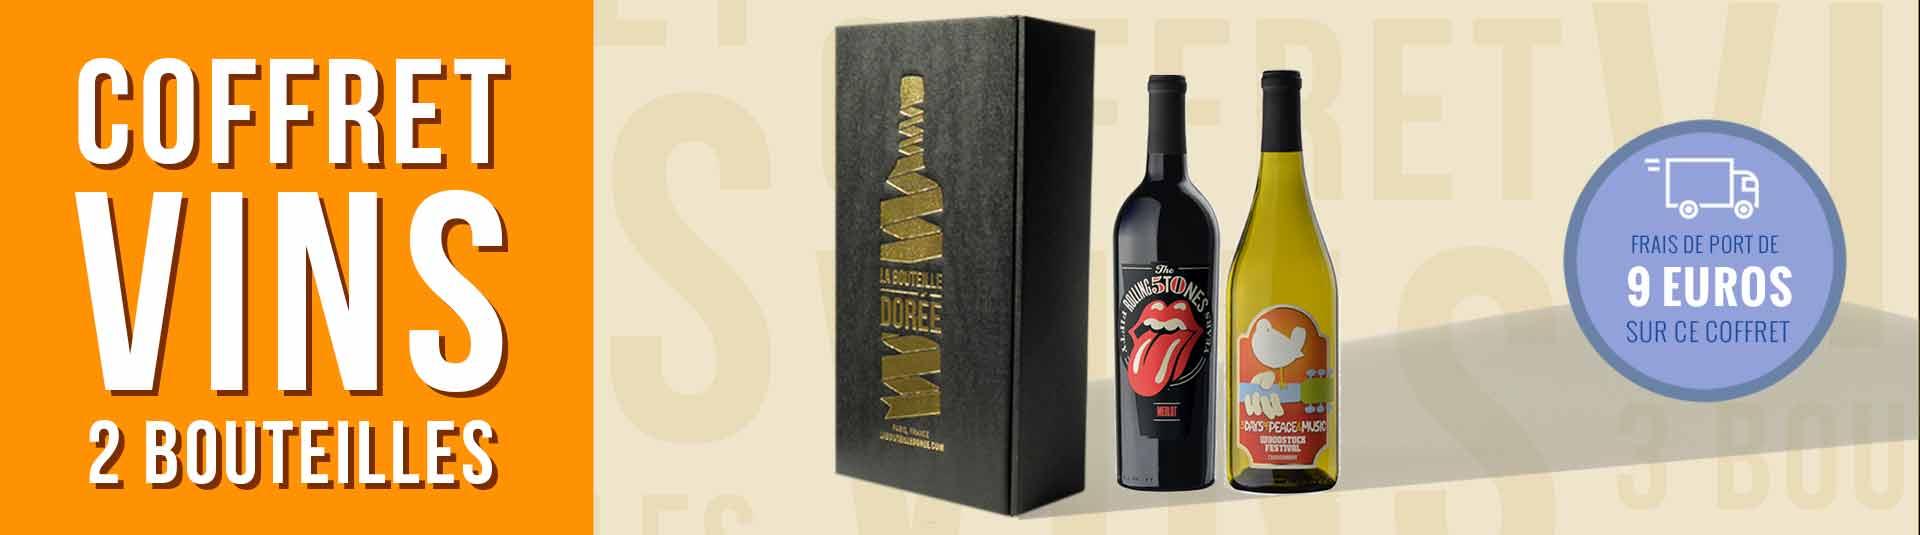 Coffret vin Rock USA 2 bouteilles